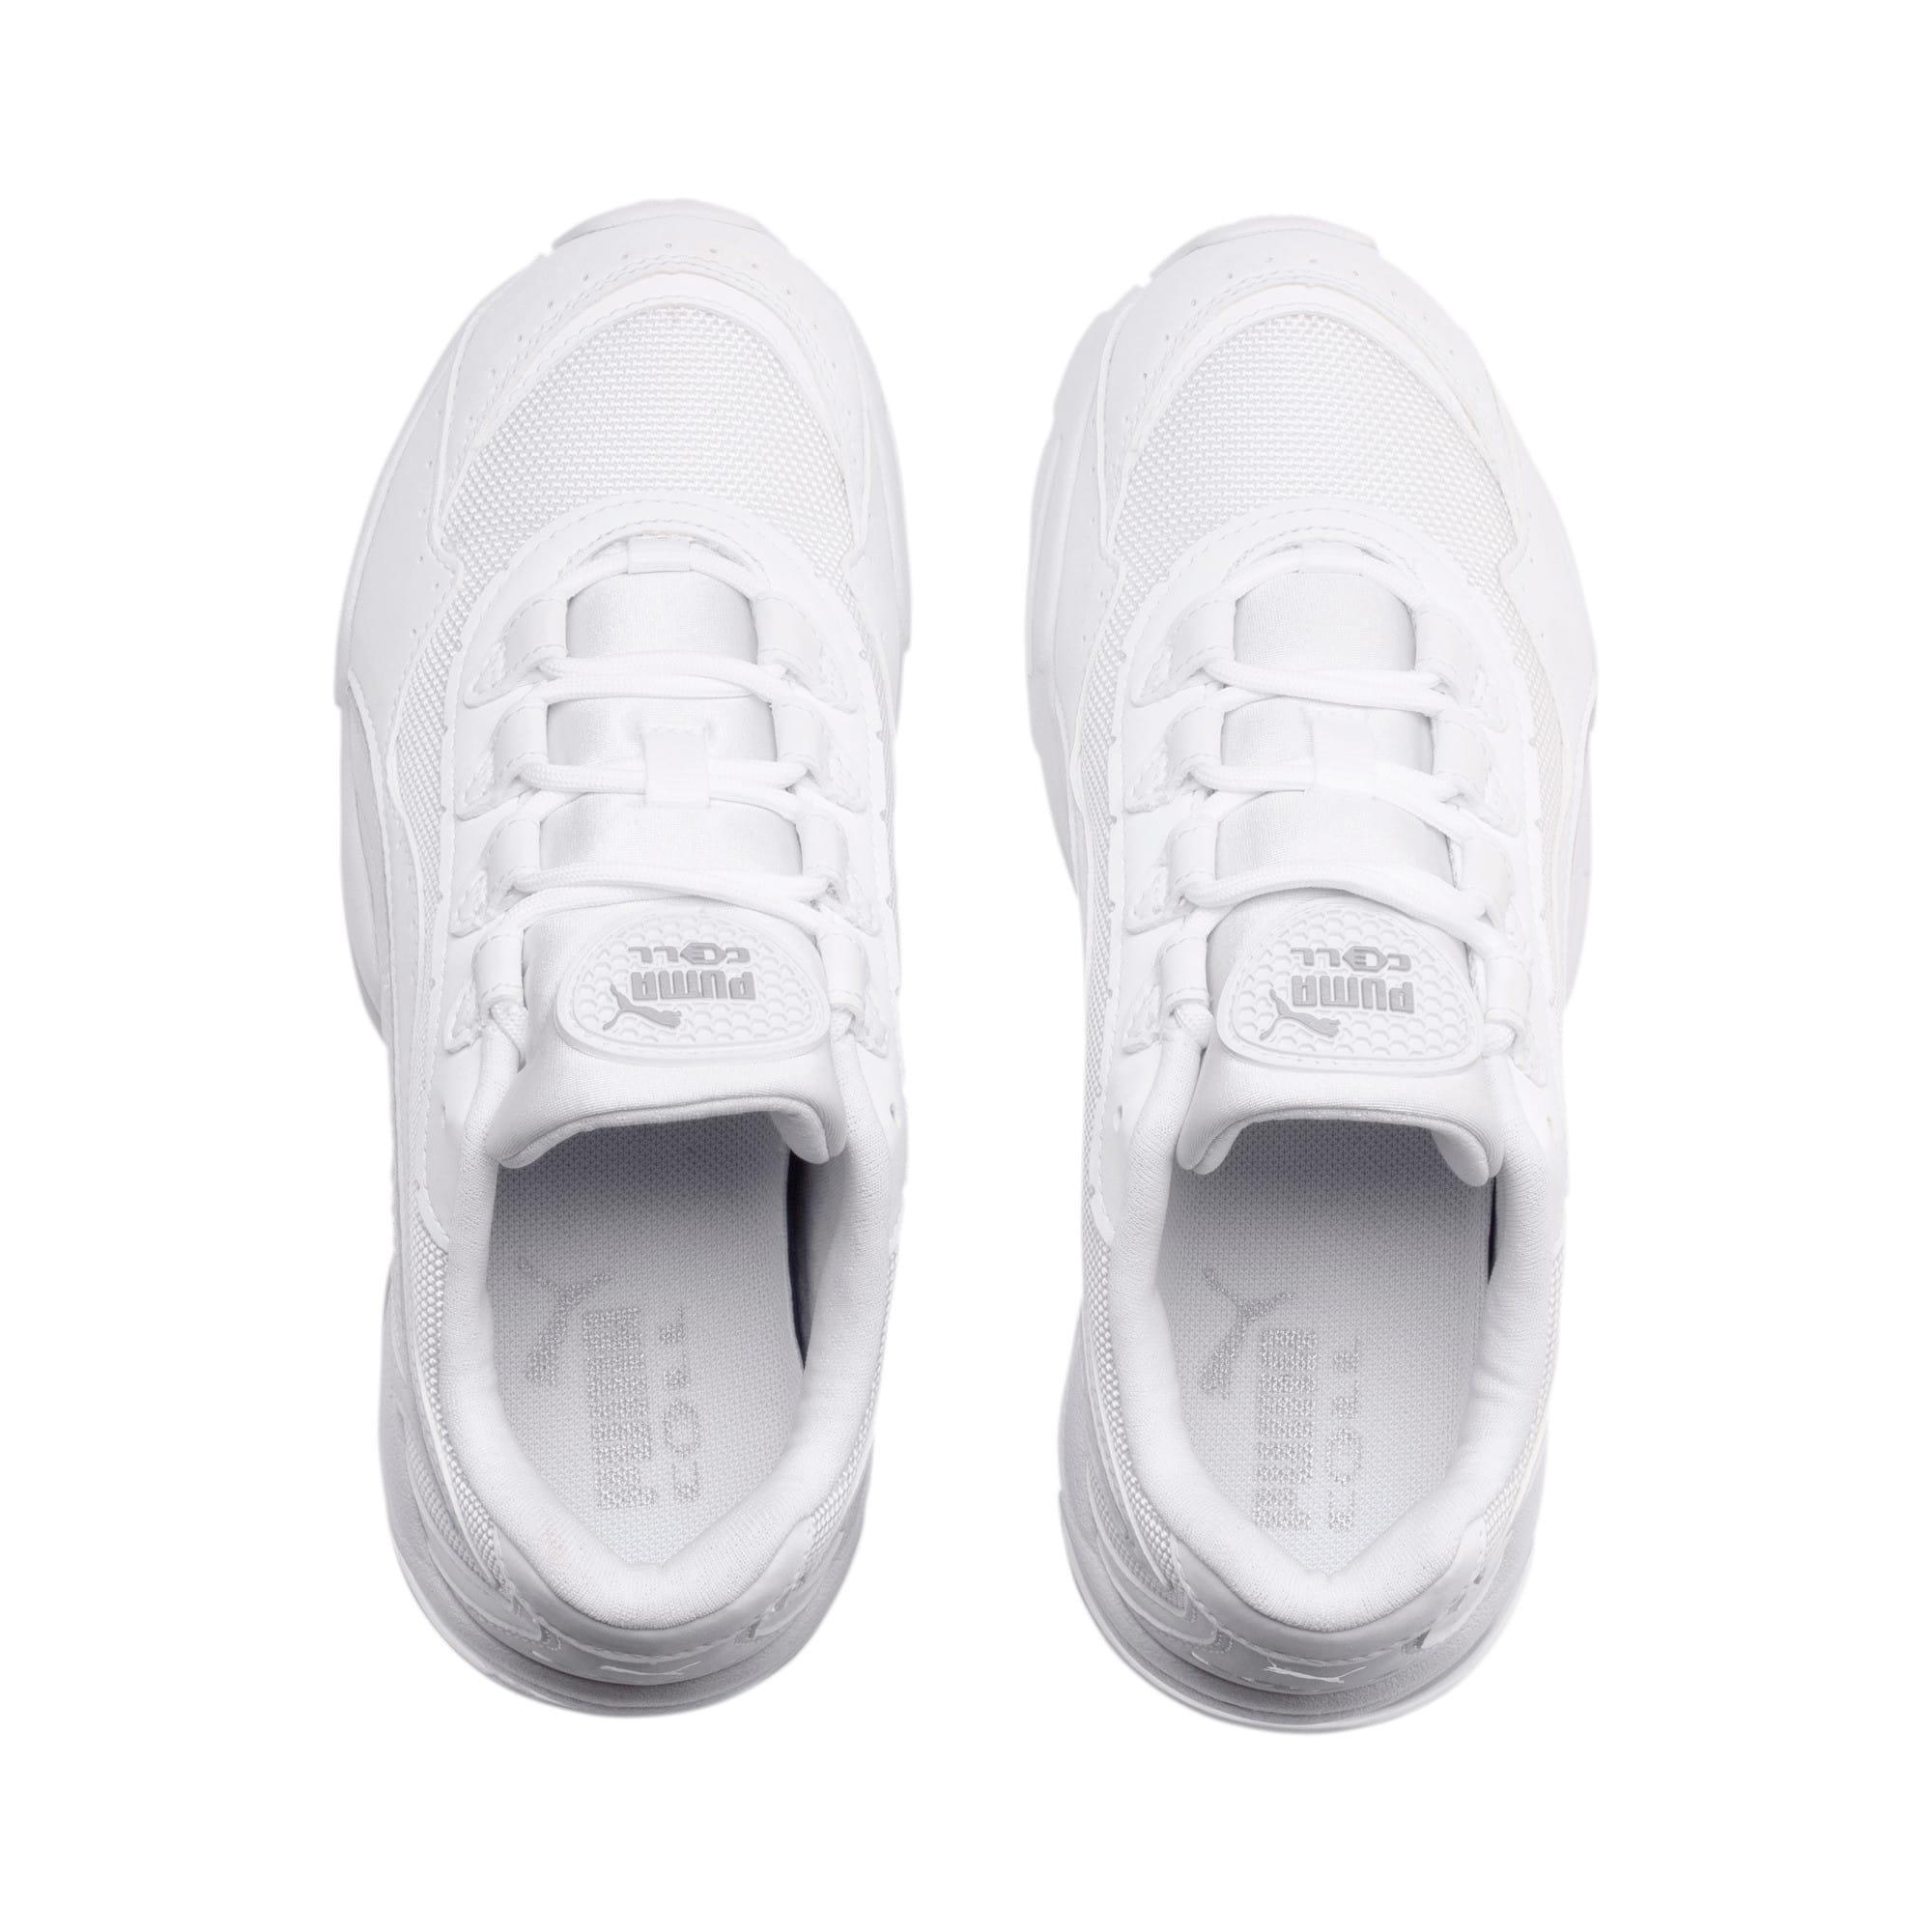 Imagen en miniatura 6 de Zapatillas de mujer CELL Stellar, Puma White-Silver, mediana